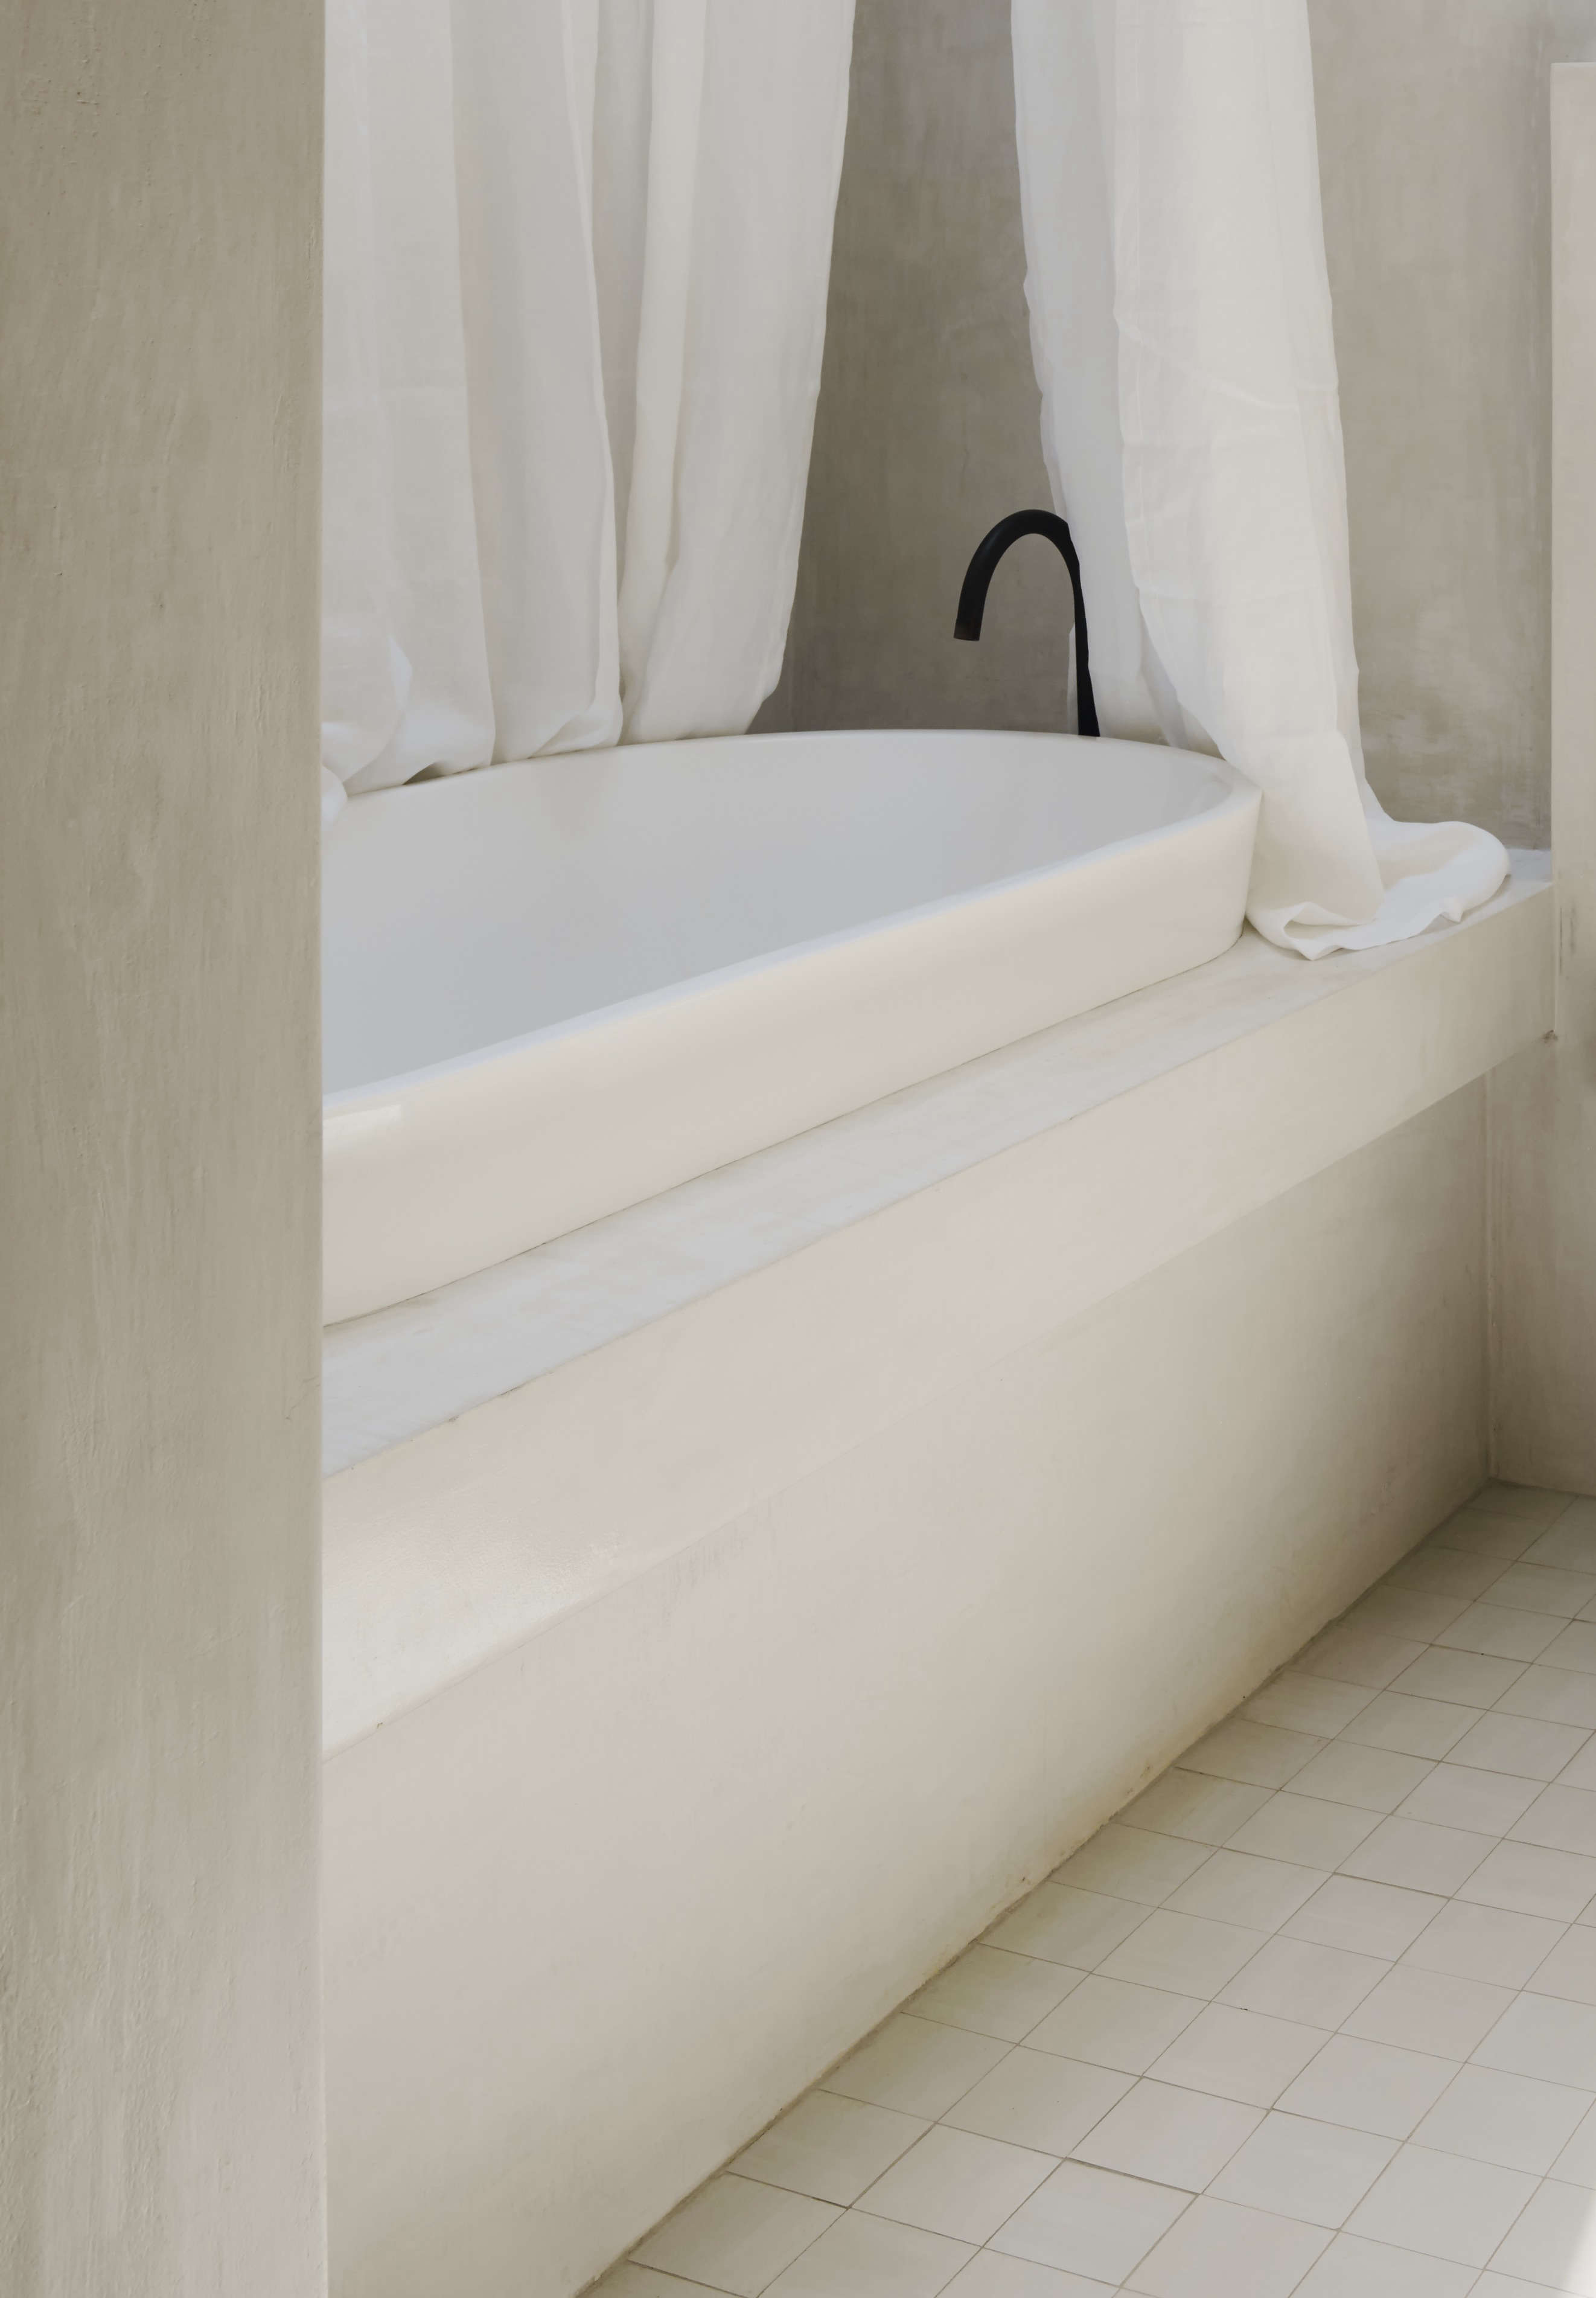 Sears Bathtubs - Cintinel.com